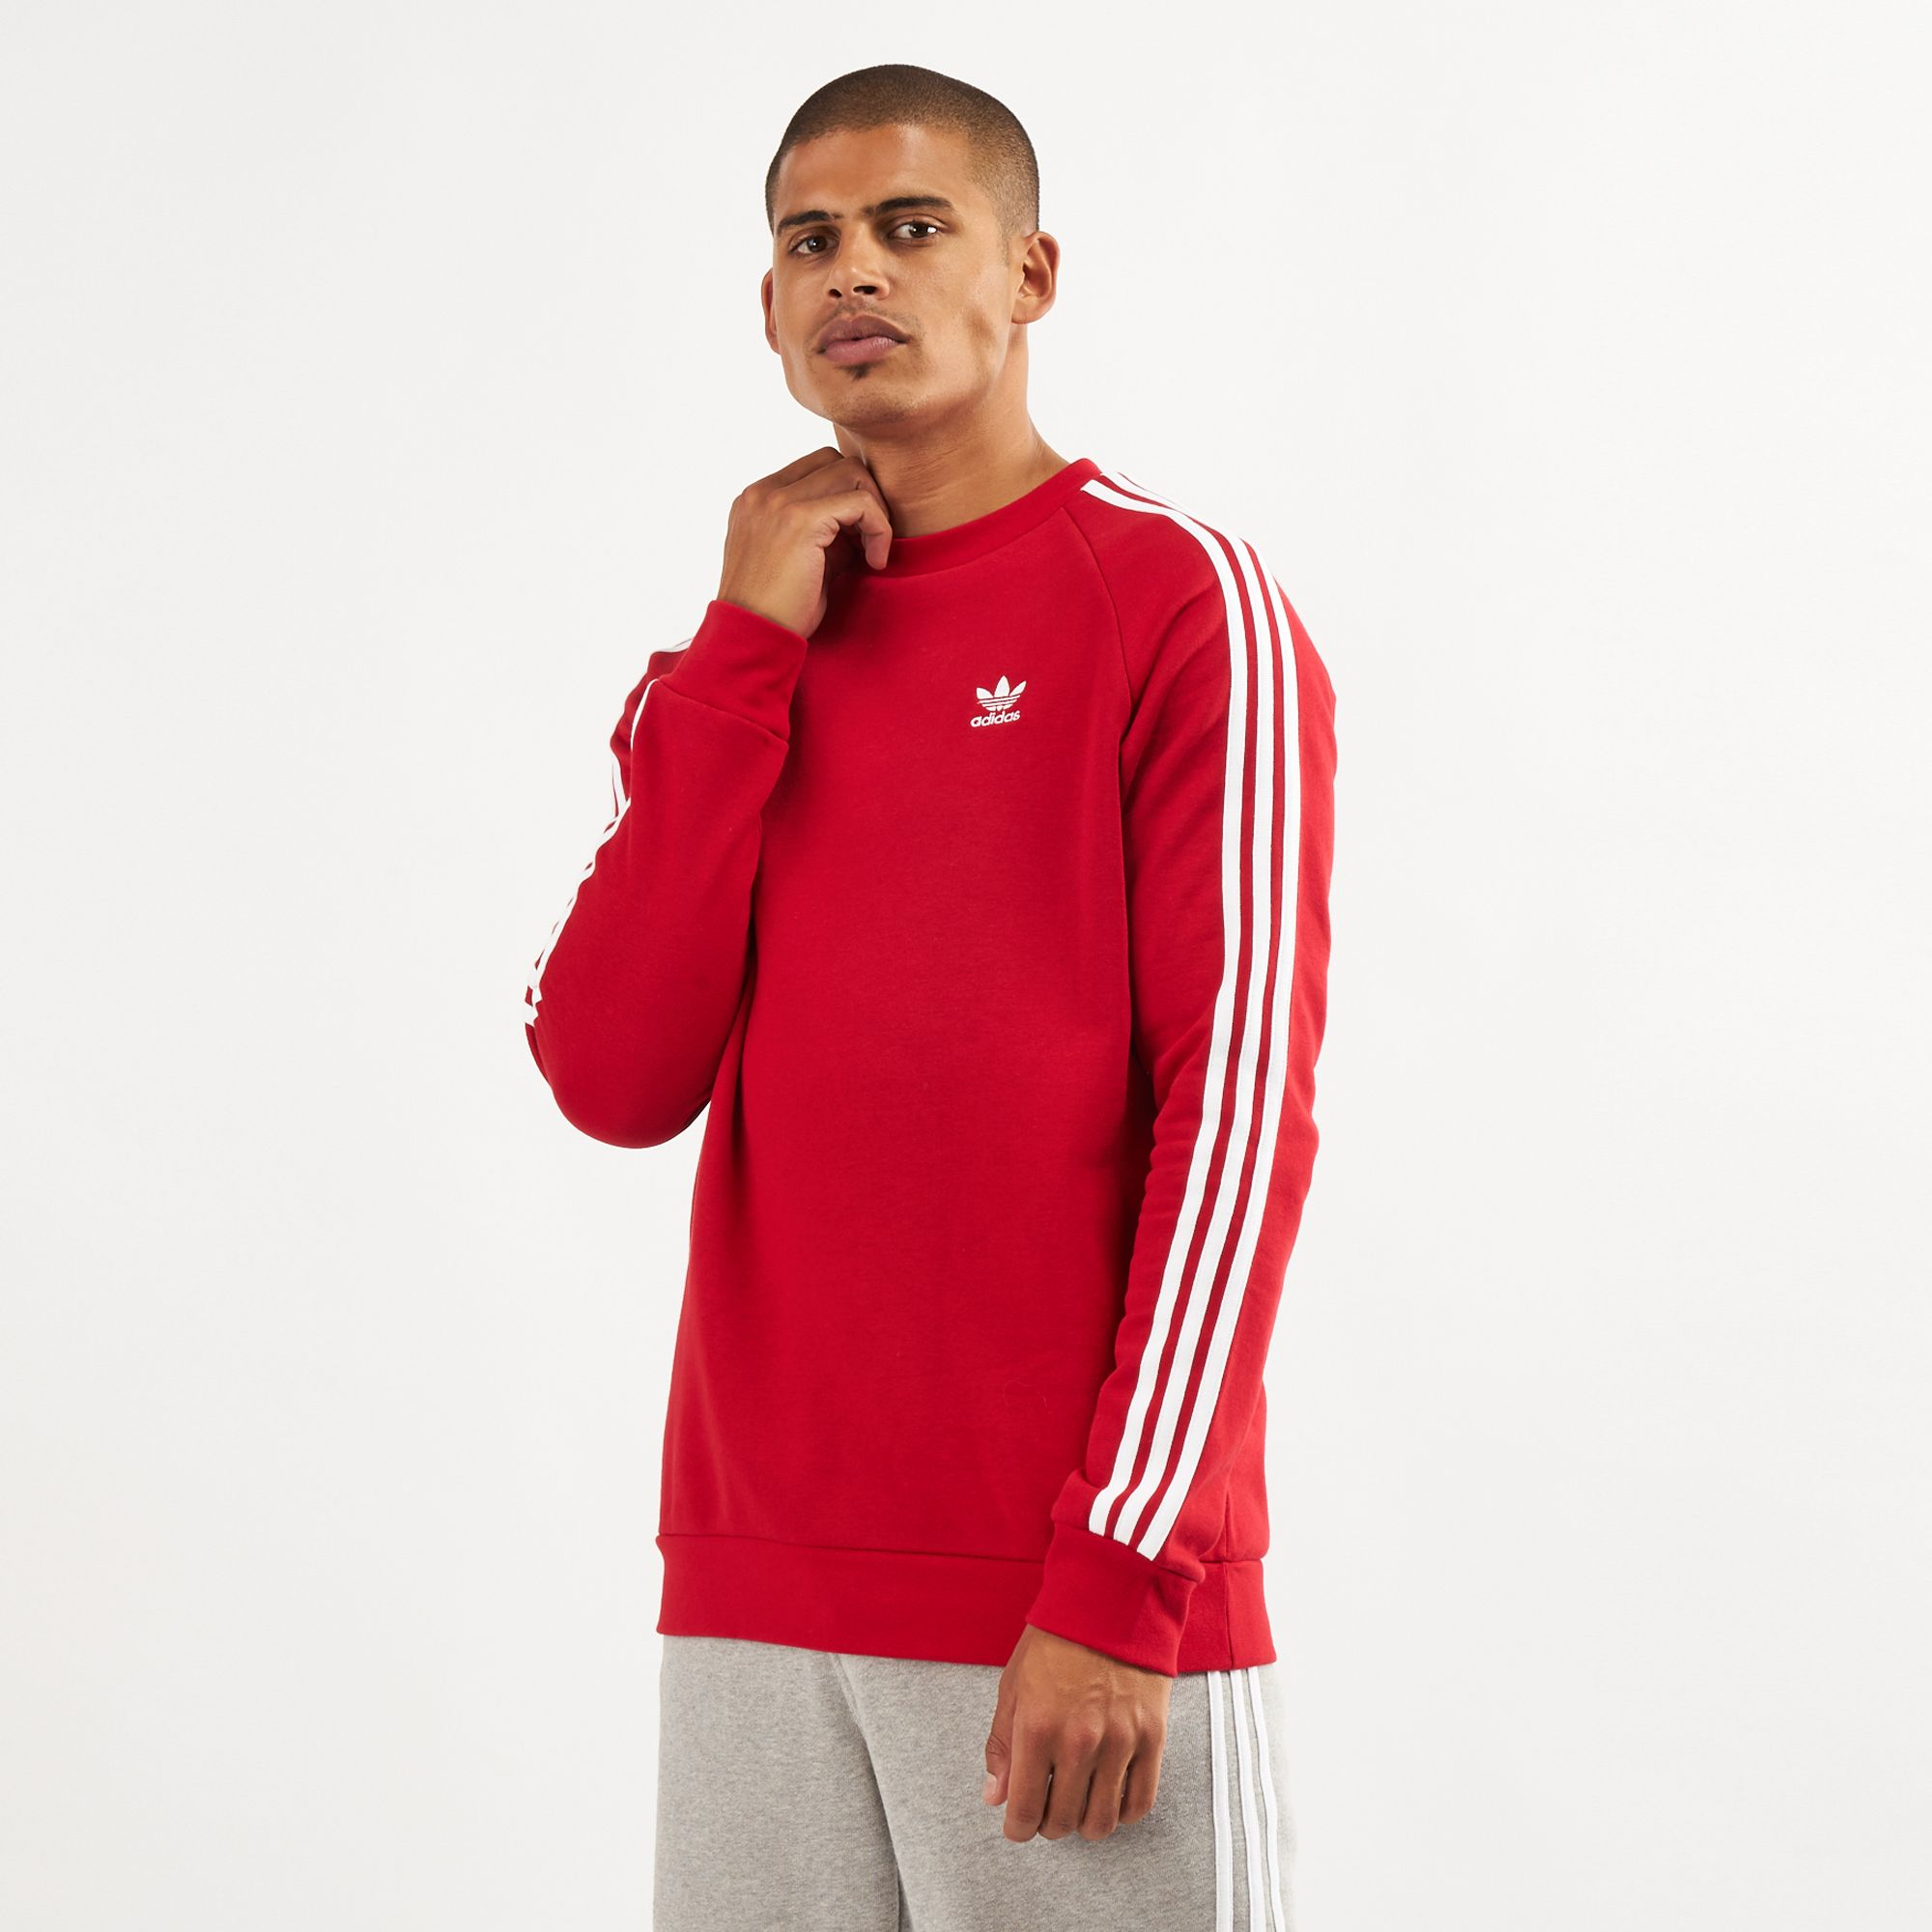 adidas Originals 3 Stripe Crew Neck Sweatshirt   Asos adidas